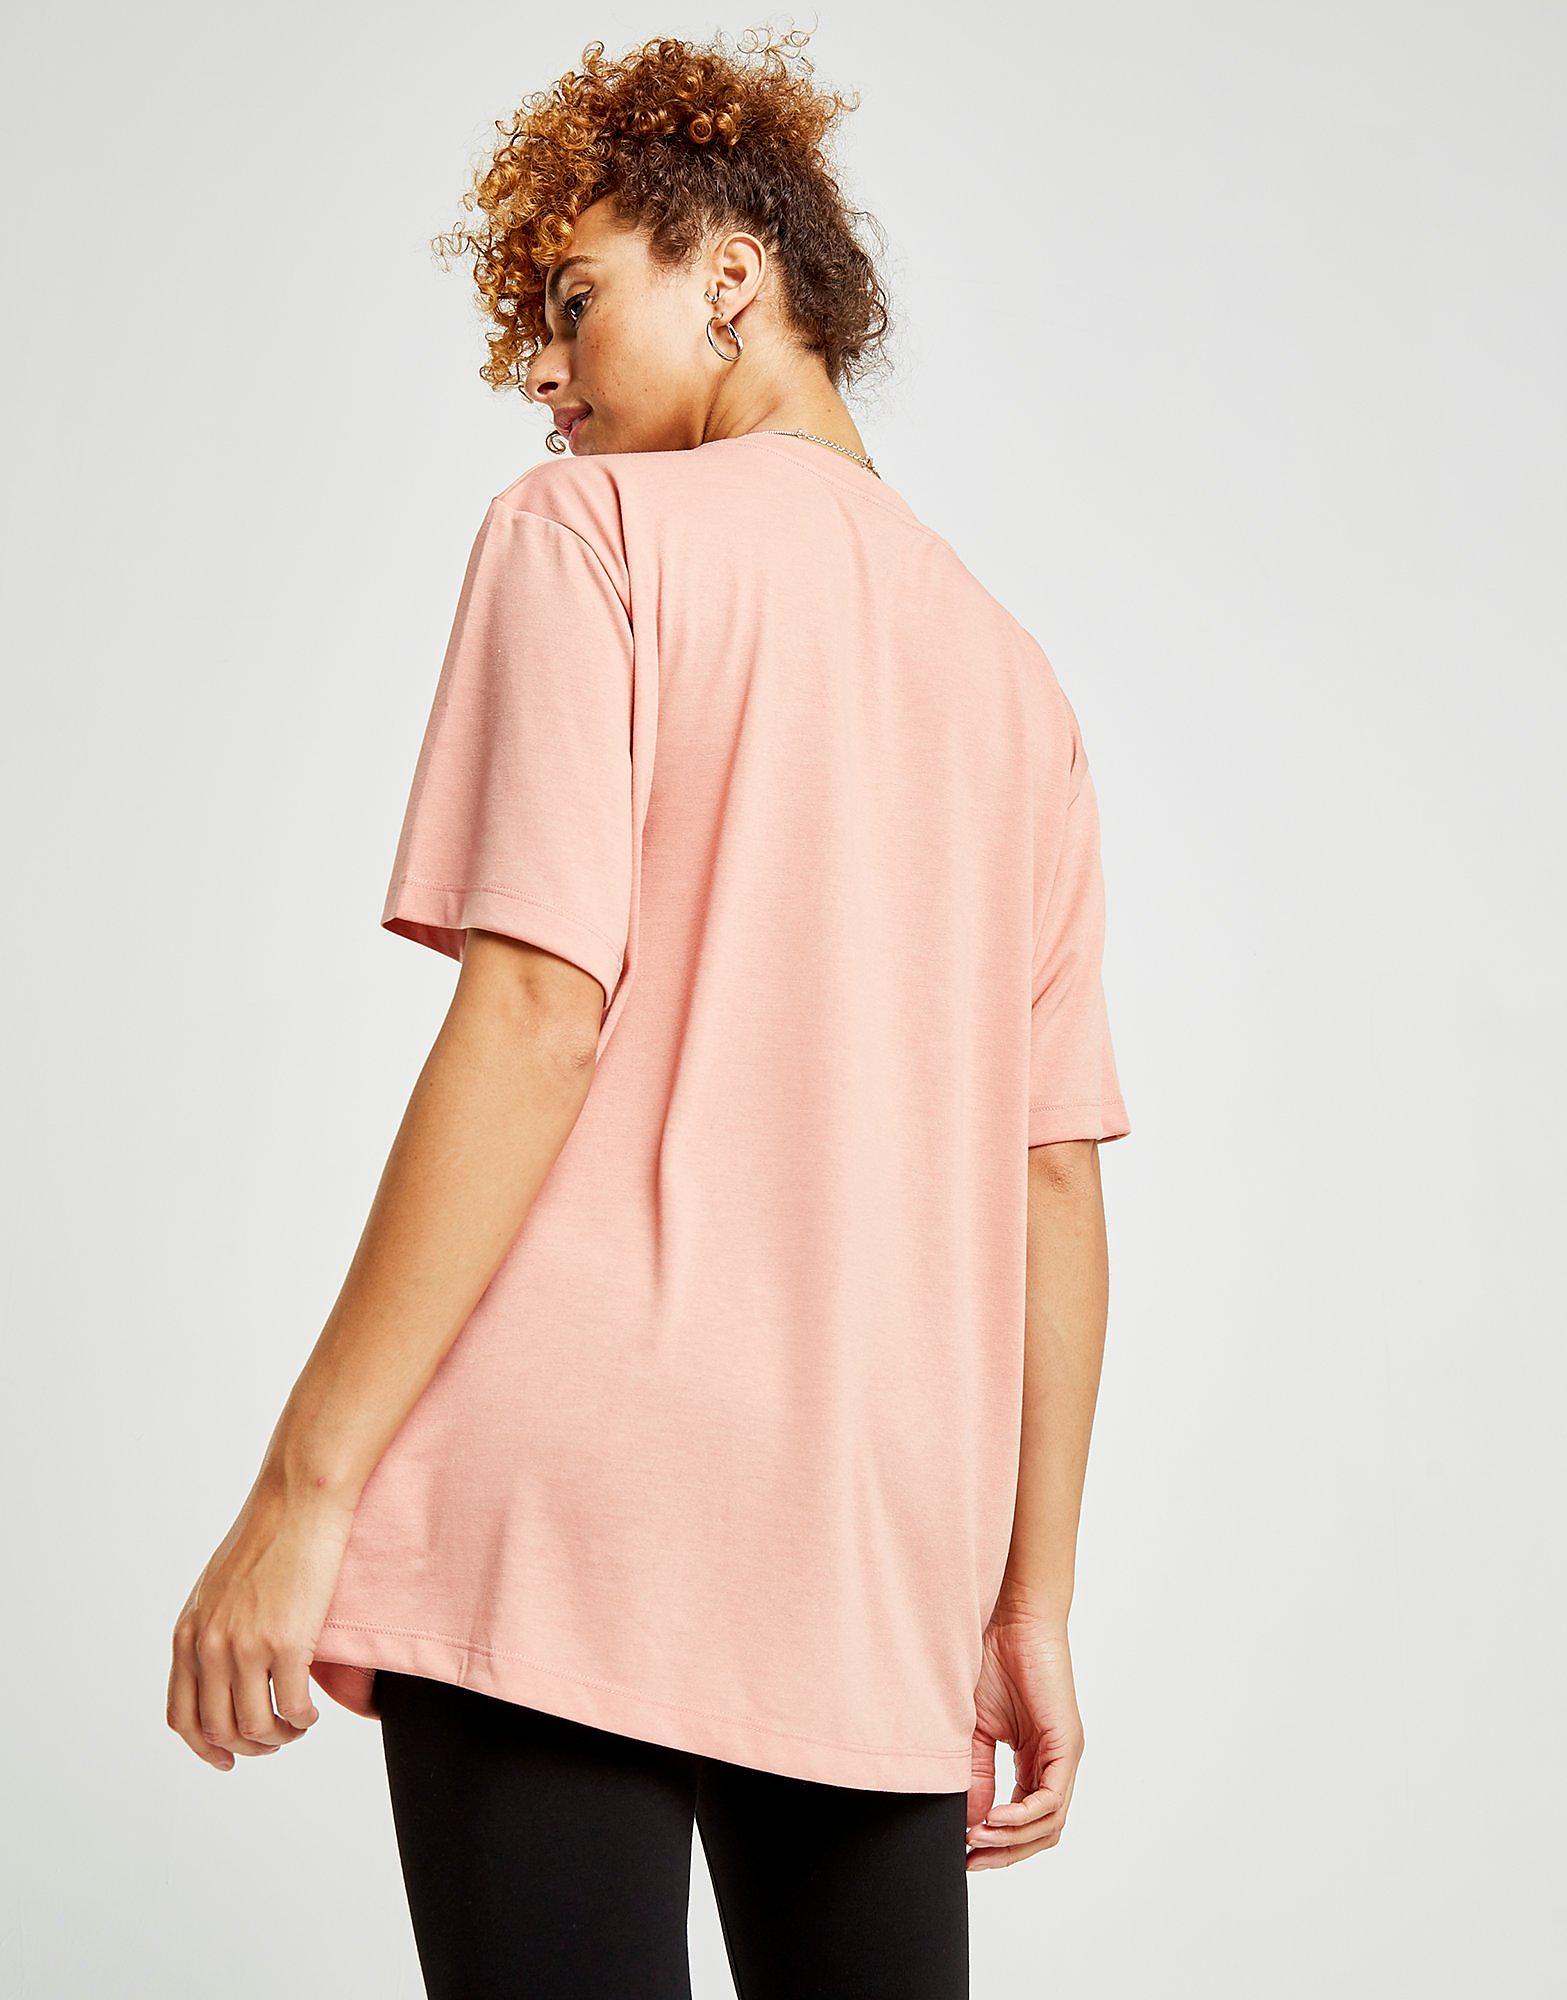 IVY PARK Boyfriend T-Shirt Dames